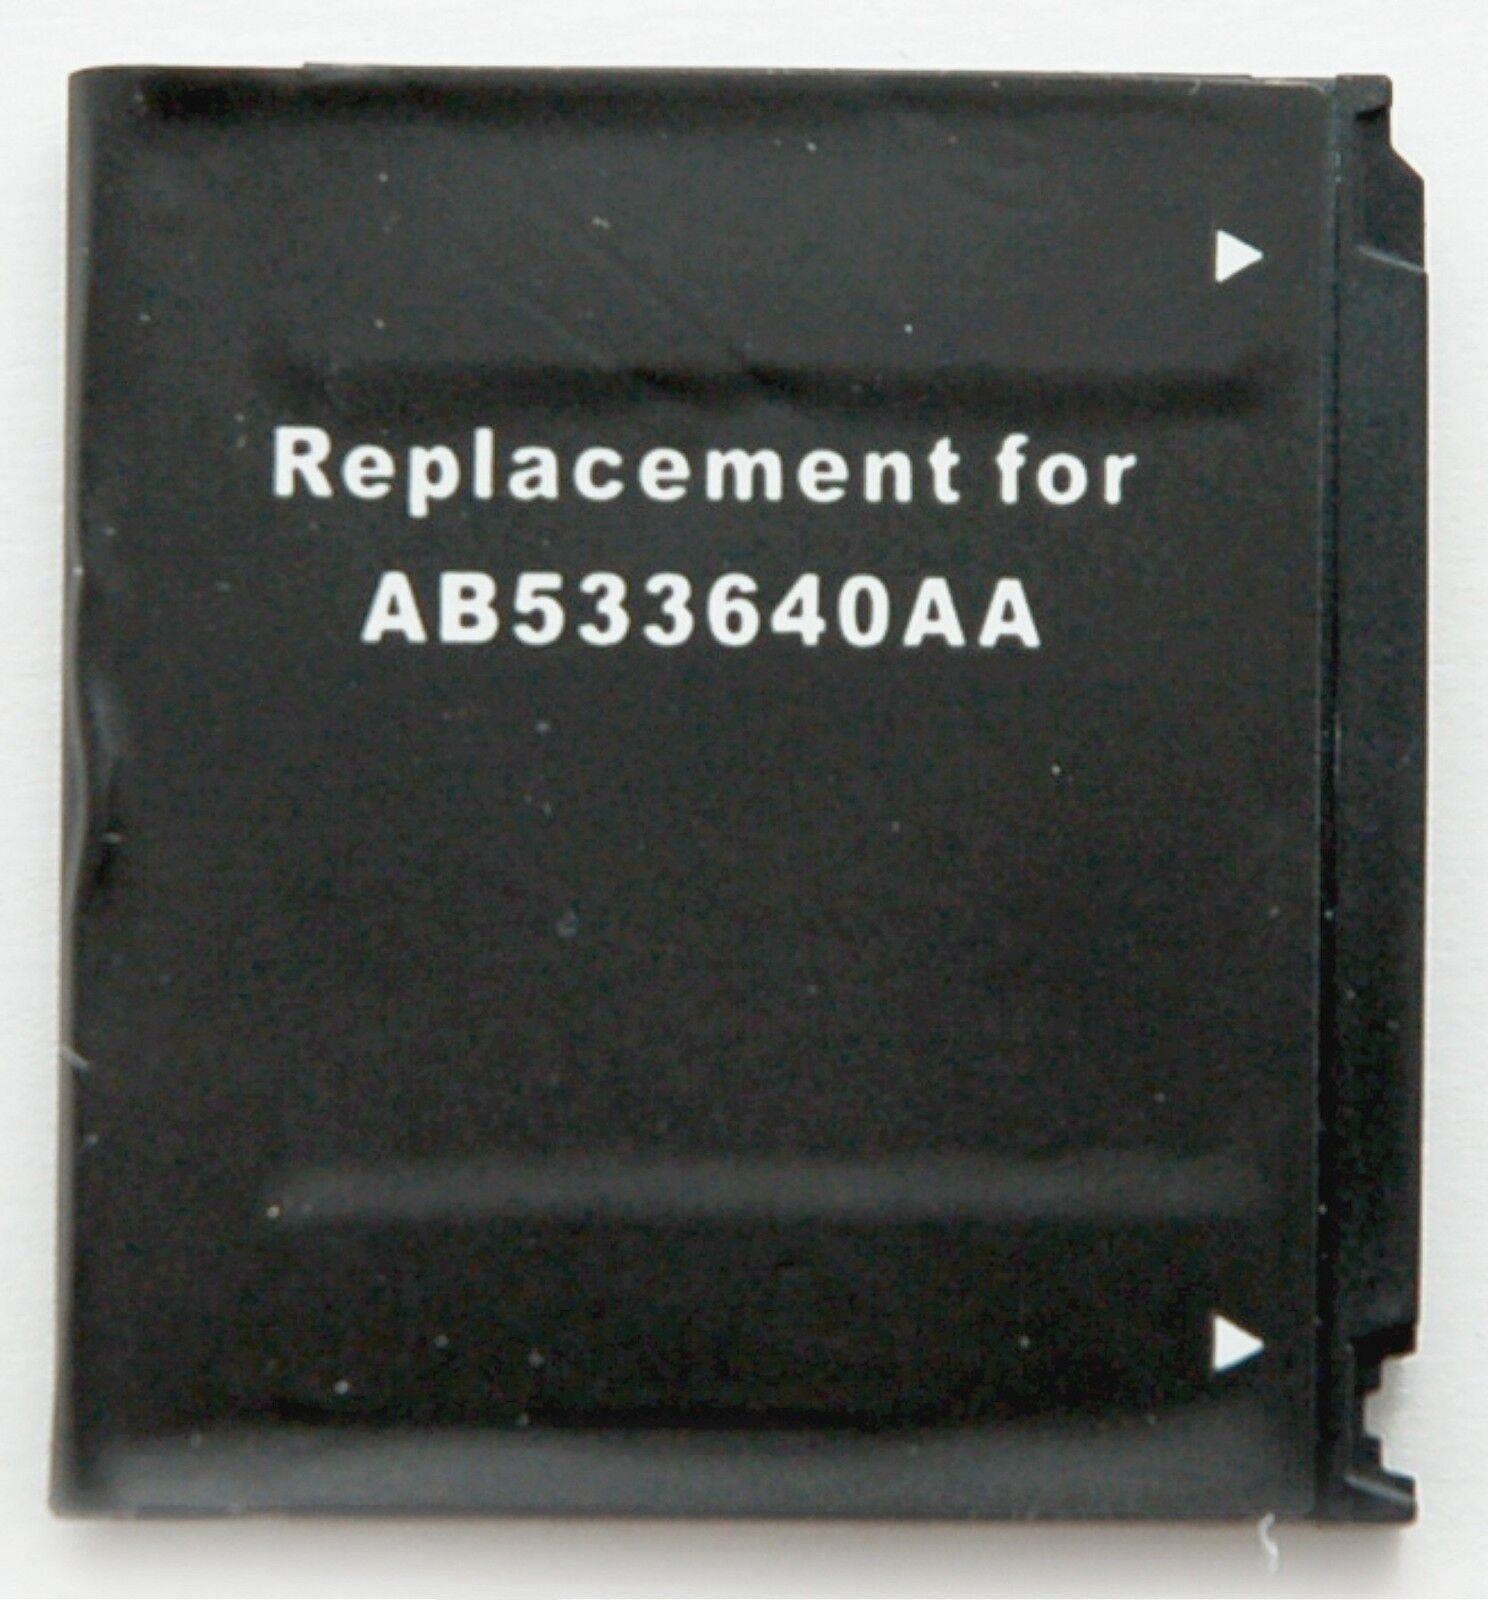 new ab533640aa cell phone battery samsung sgh a437 a436 slm a747 slm rh ebay com Samsung SGH- A657 Samsung SGH- D807